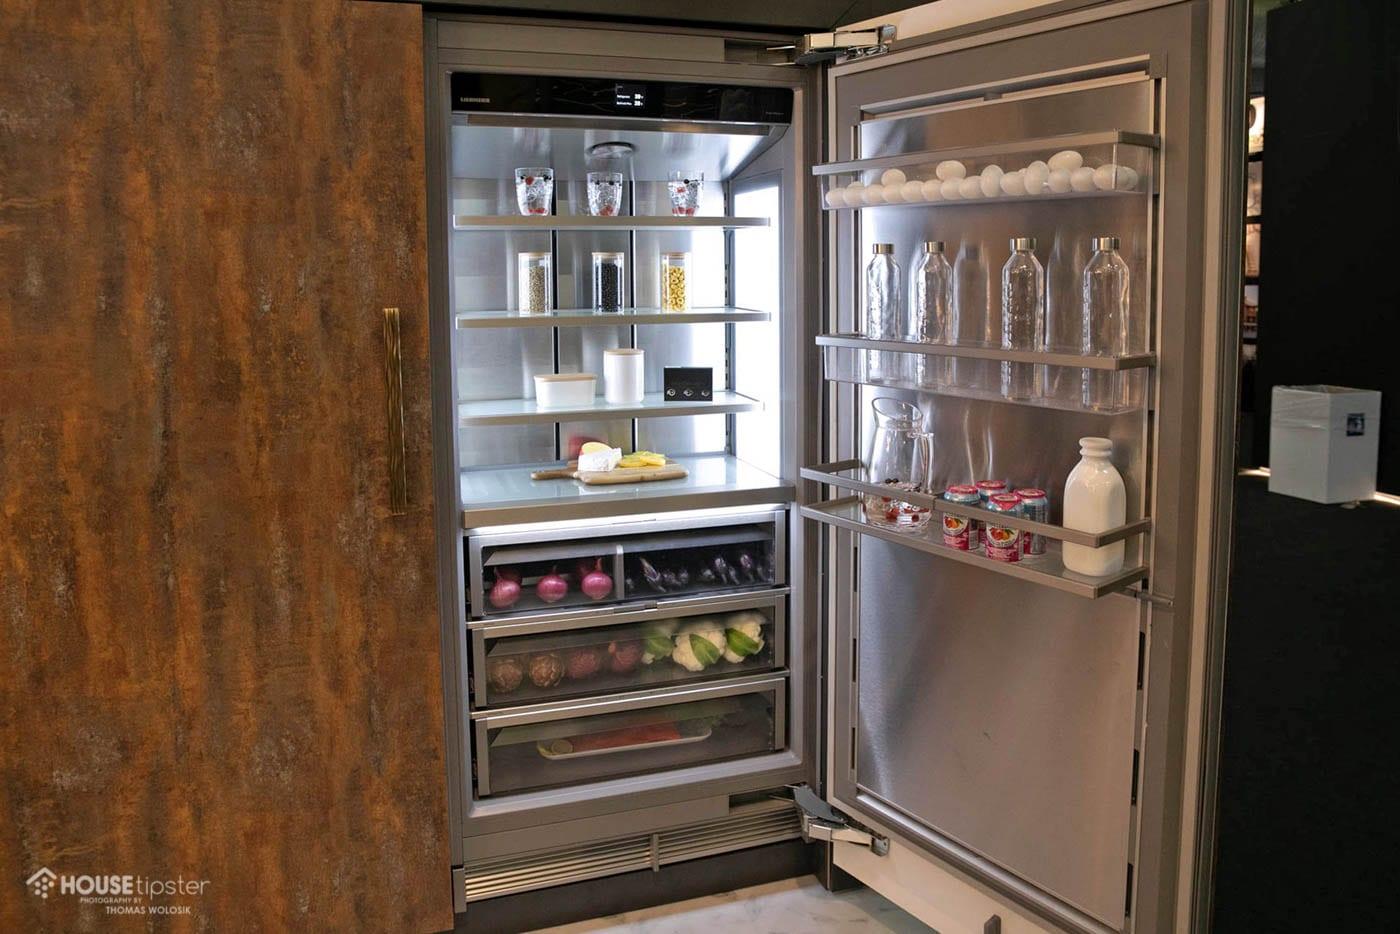 Liebherr Refrigerators Take Center Stage in NYC | House